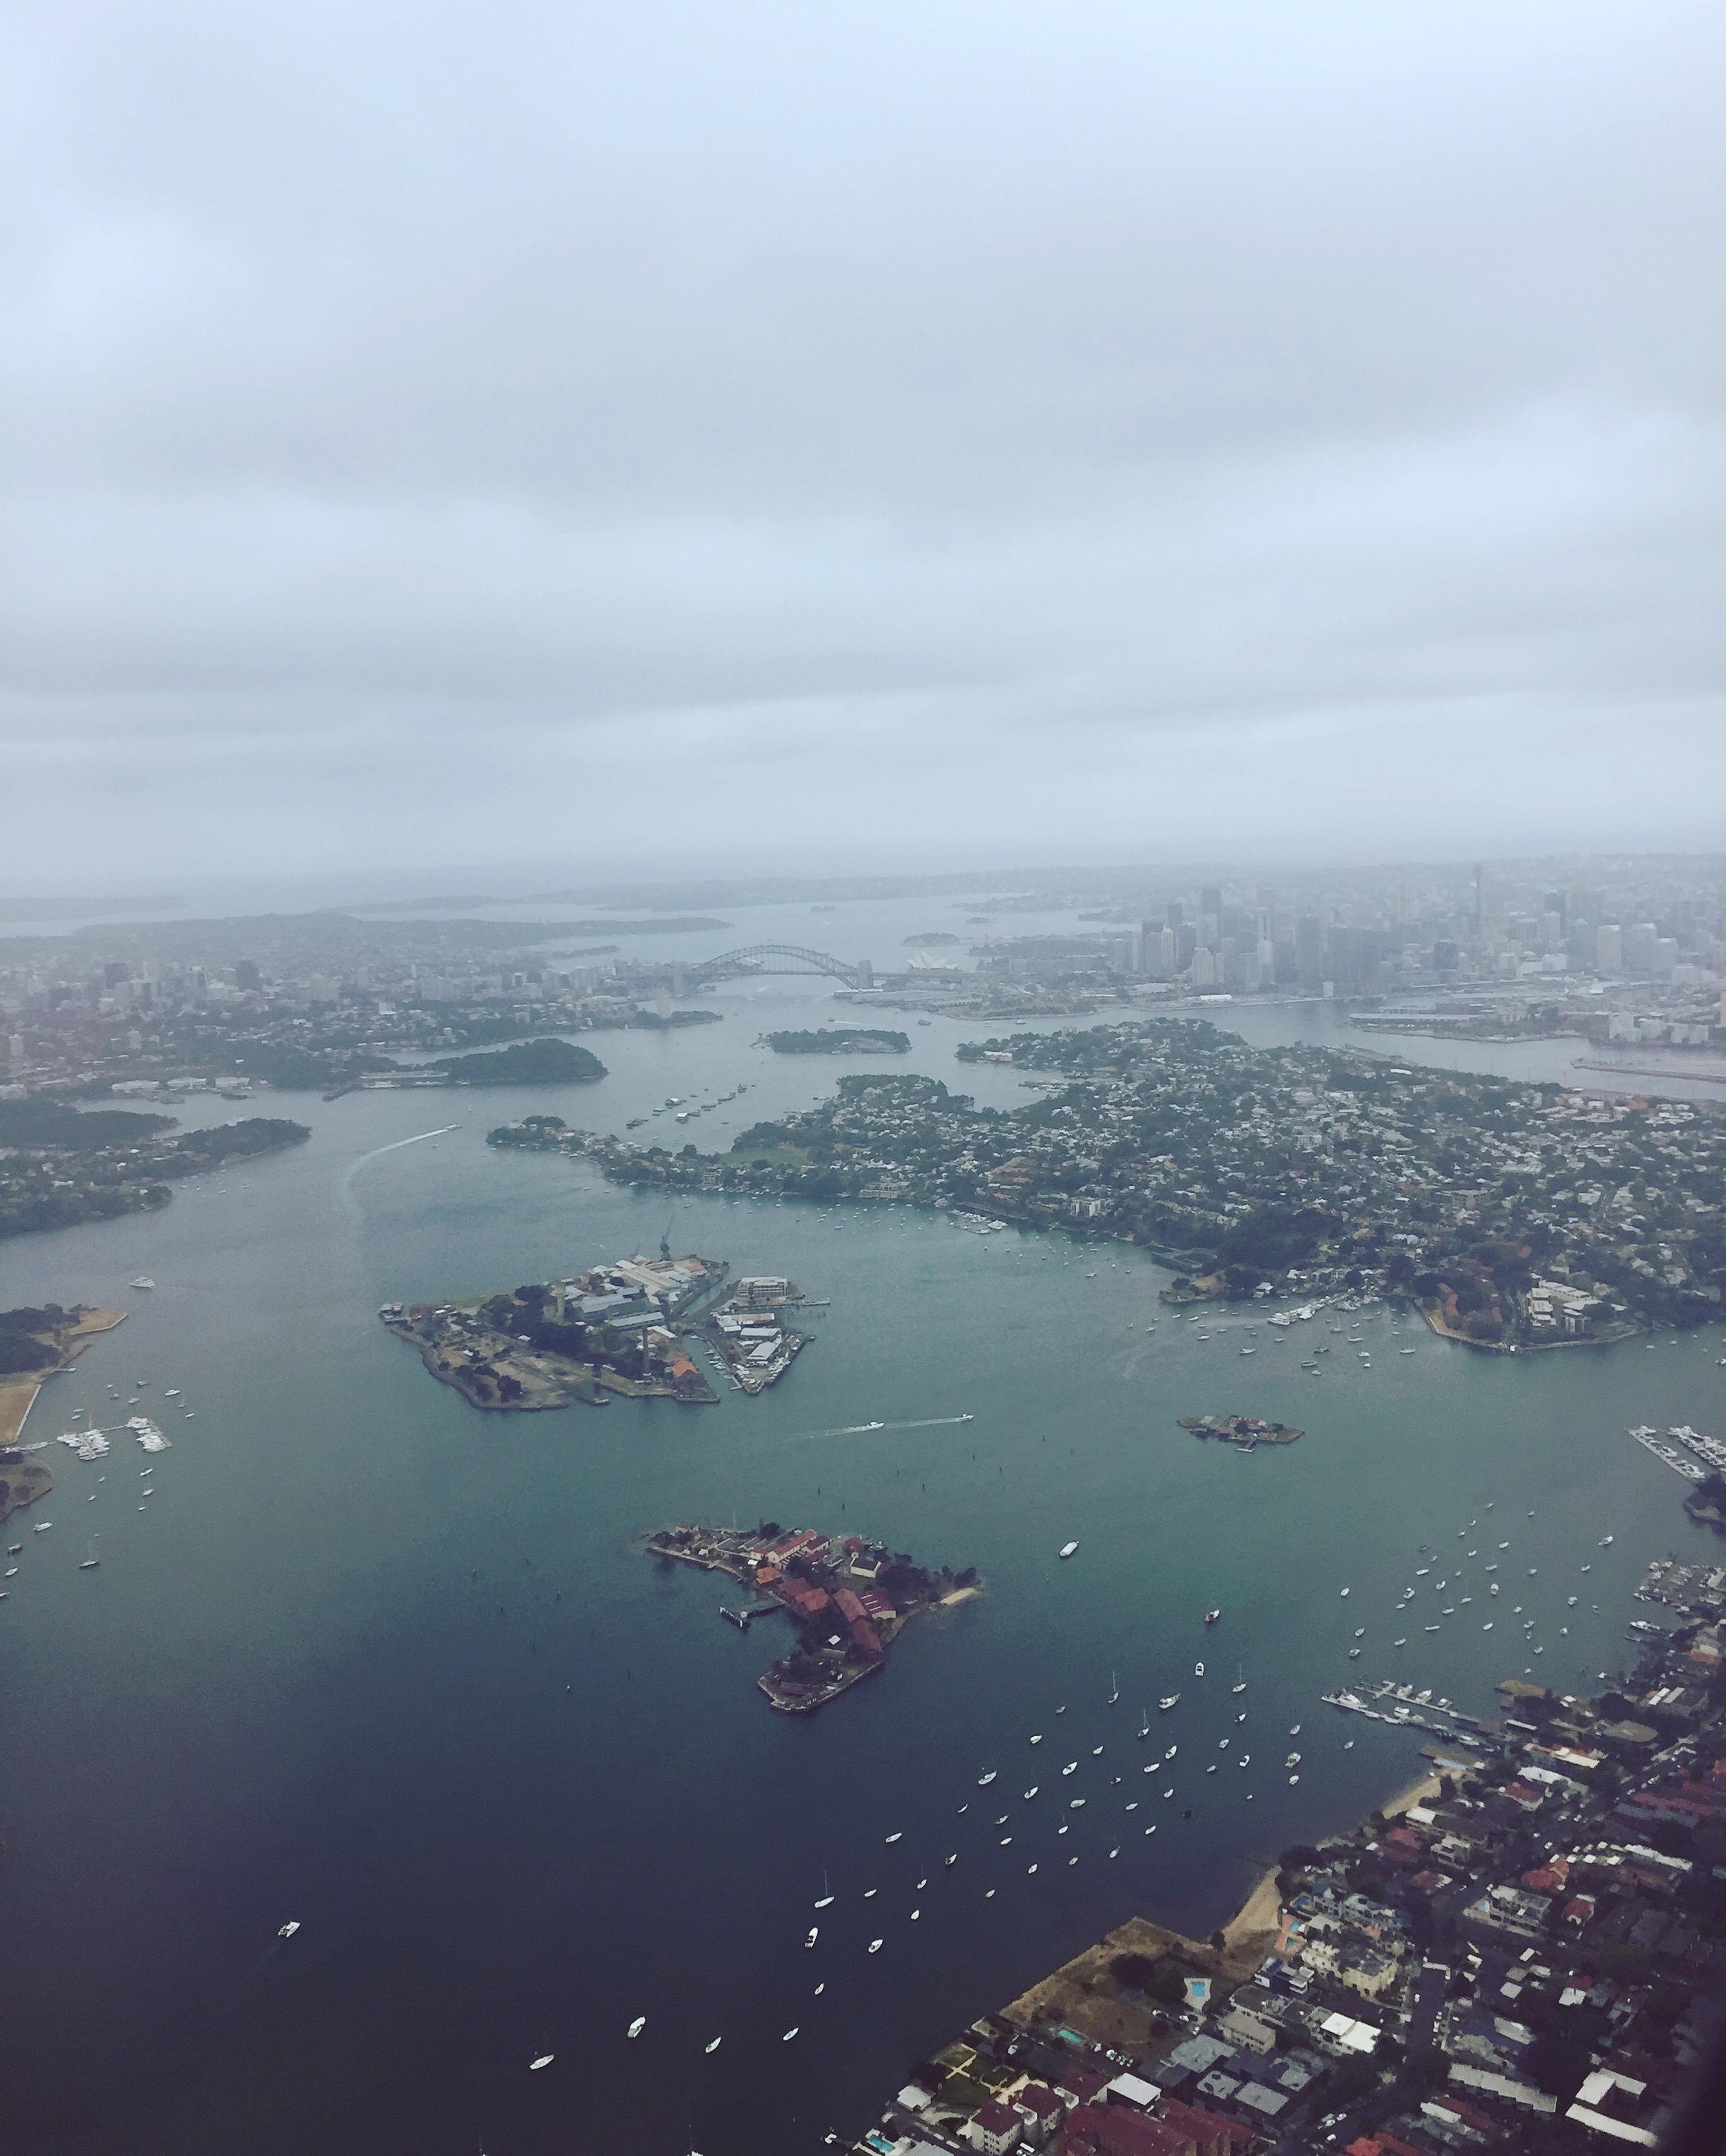 CAPAStudyAbroad_Sydney_Fall2017_From Hanna Okhrimchuk - Sydney from the Plane.jpg